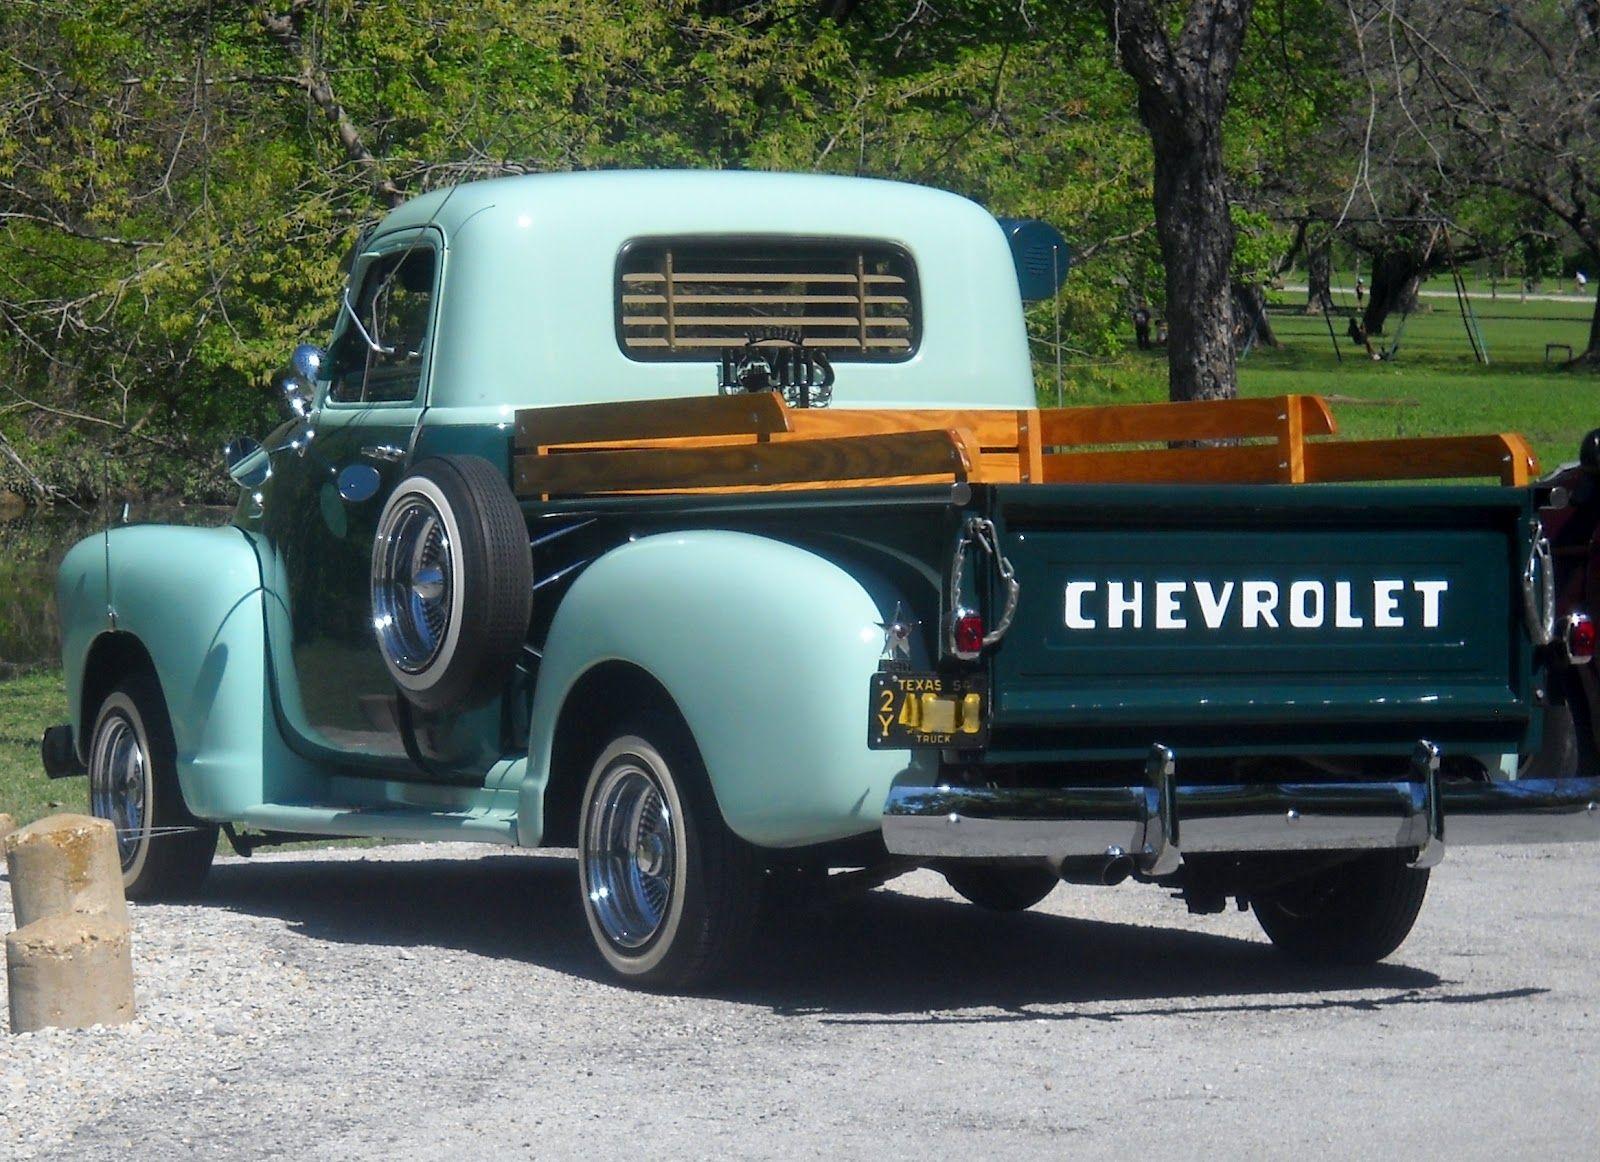 1940 Chevy Pickup Rat Rod 1940 Chevrolet Truck Hot Rod Shop